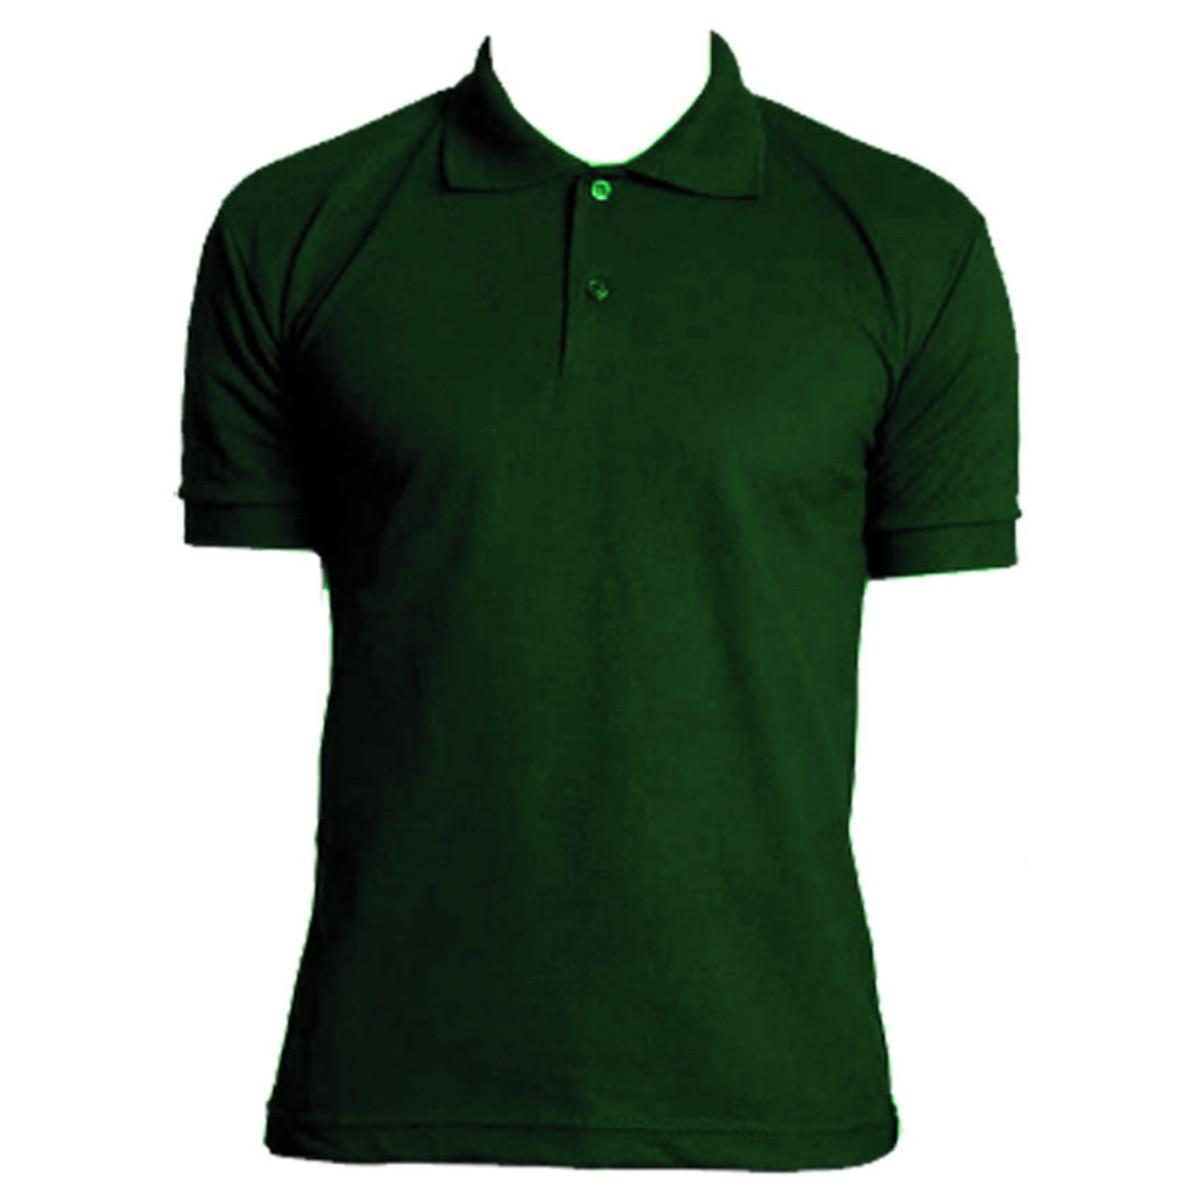 73de625016403 Camisa Polo Masculino Verde Musgo Masson no Elo7